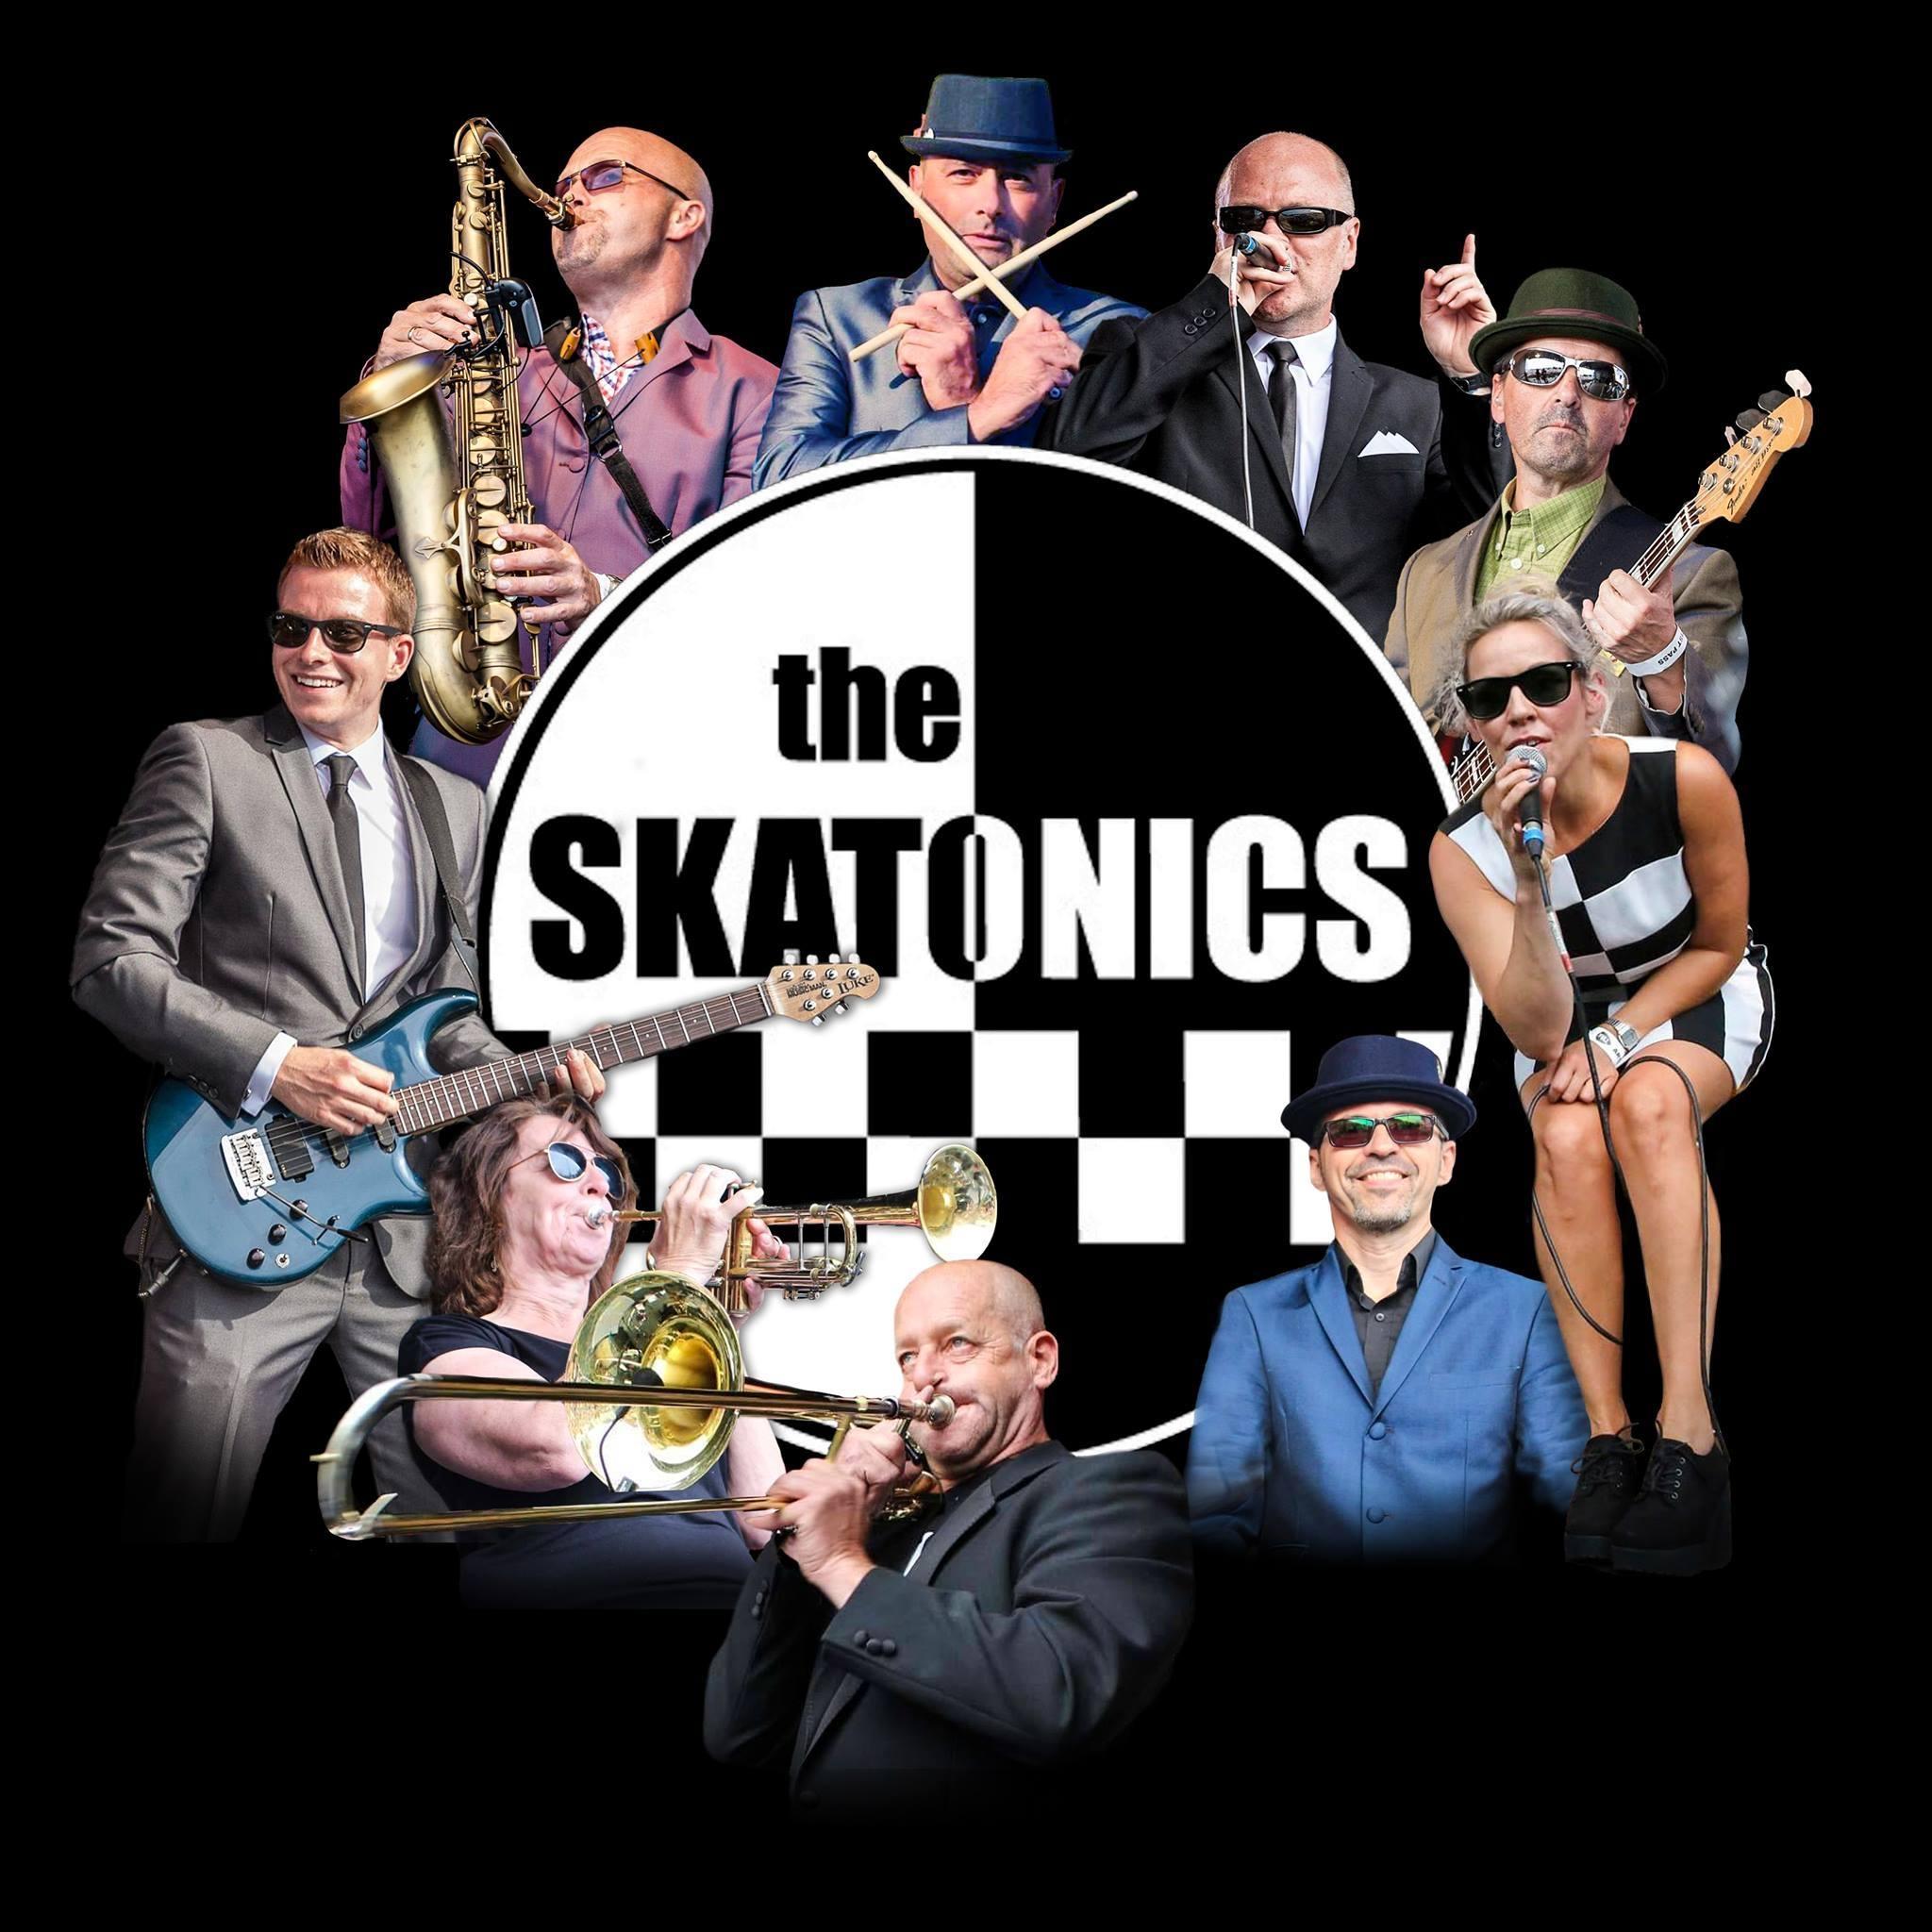 'The Skatonics' banner image